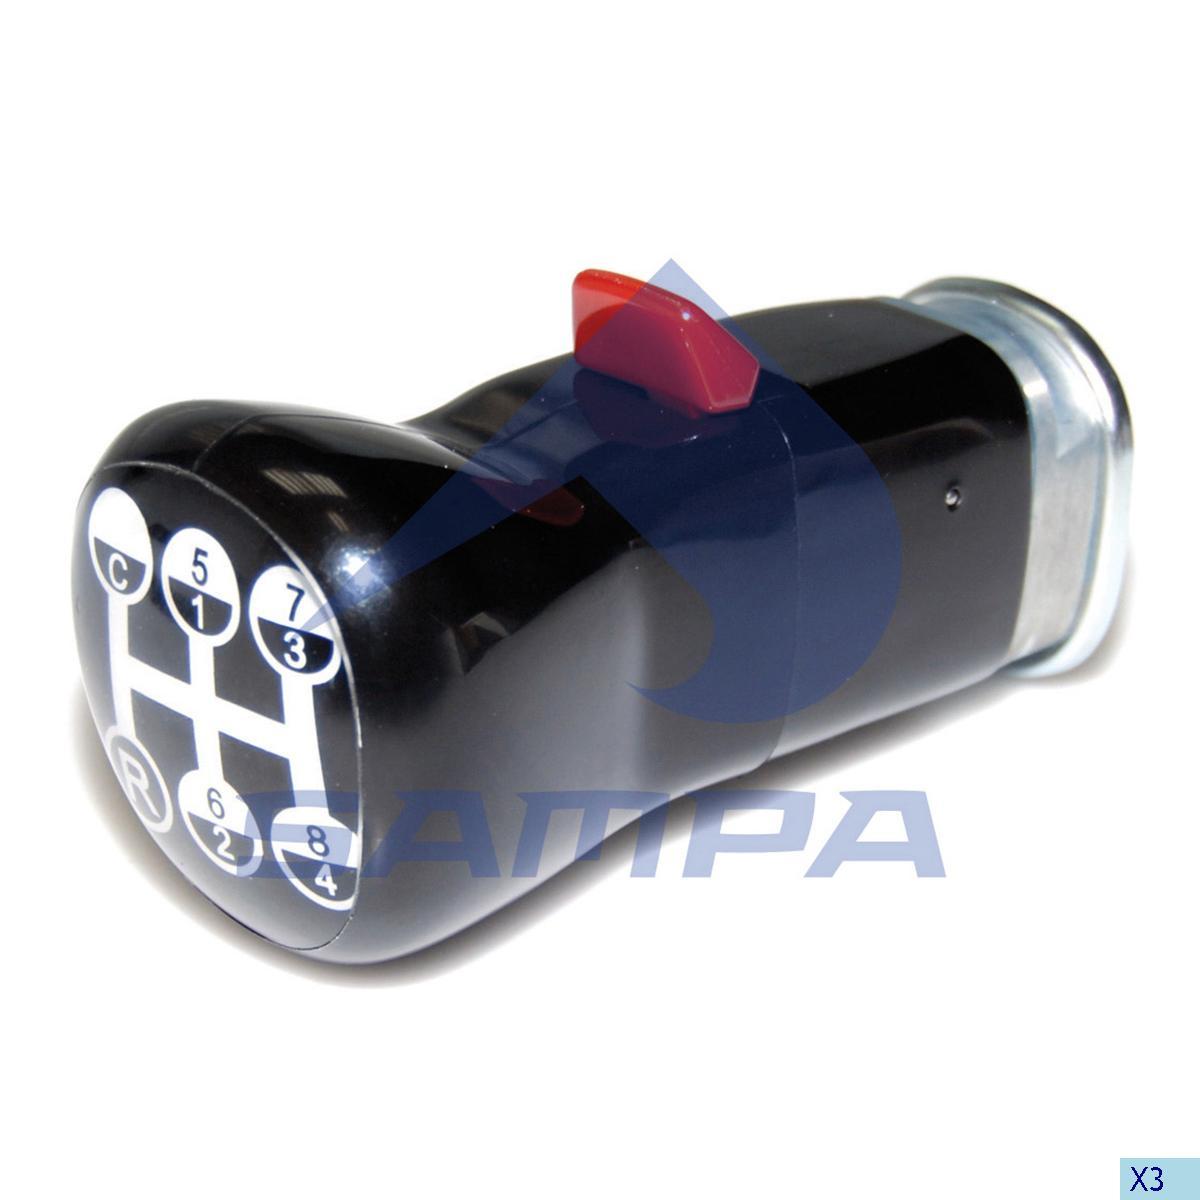 Knob, Gear Shift, Volvo, Gear Box